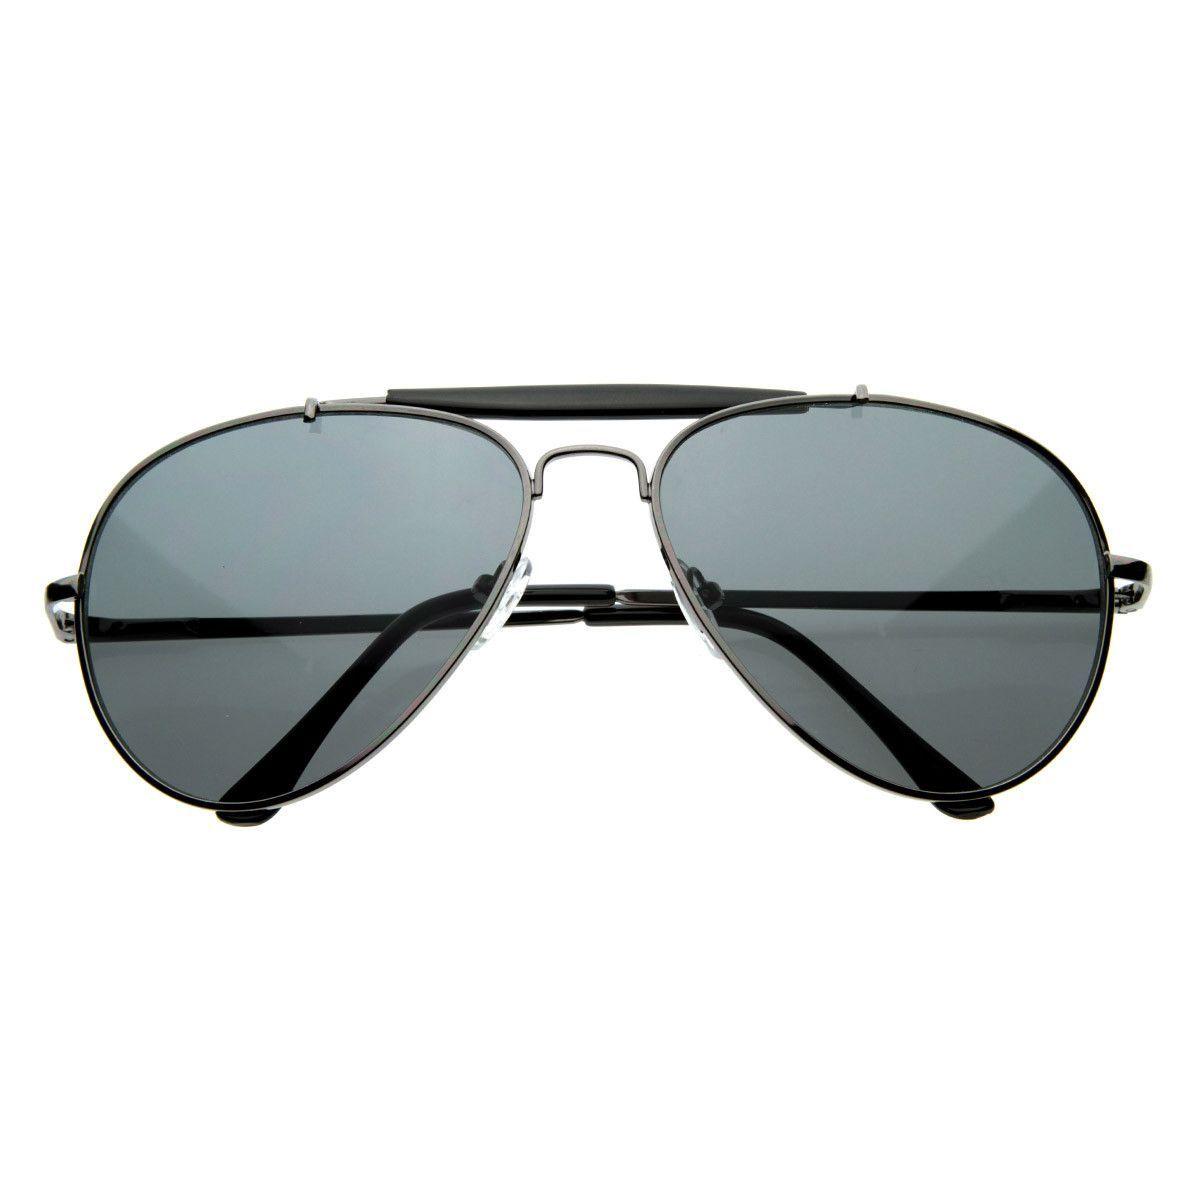 Premium Standard Aviator Sunglasses with Cross Bar